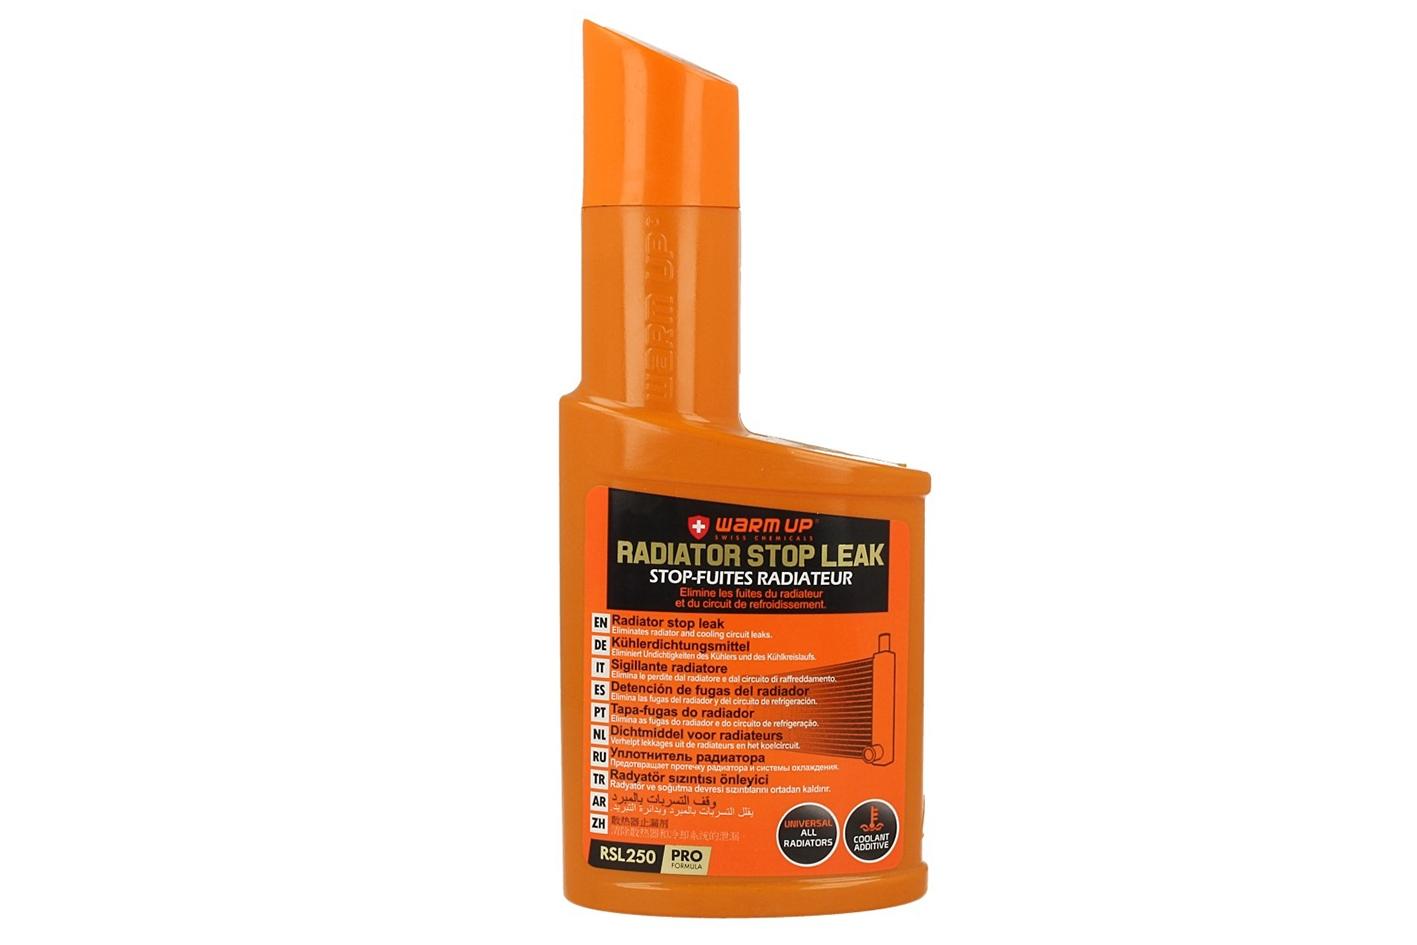 WARM UP Radiator Stop Leak Anti Fughe Sigillante Radiatori a Base Polimeri Attivi Applicazione Curativa e Preventiva 250ml - PZ